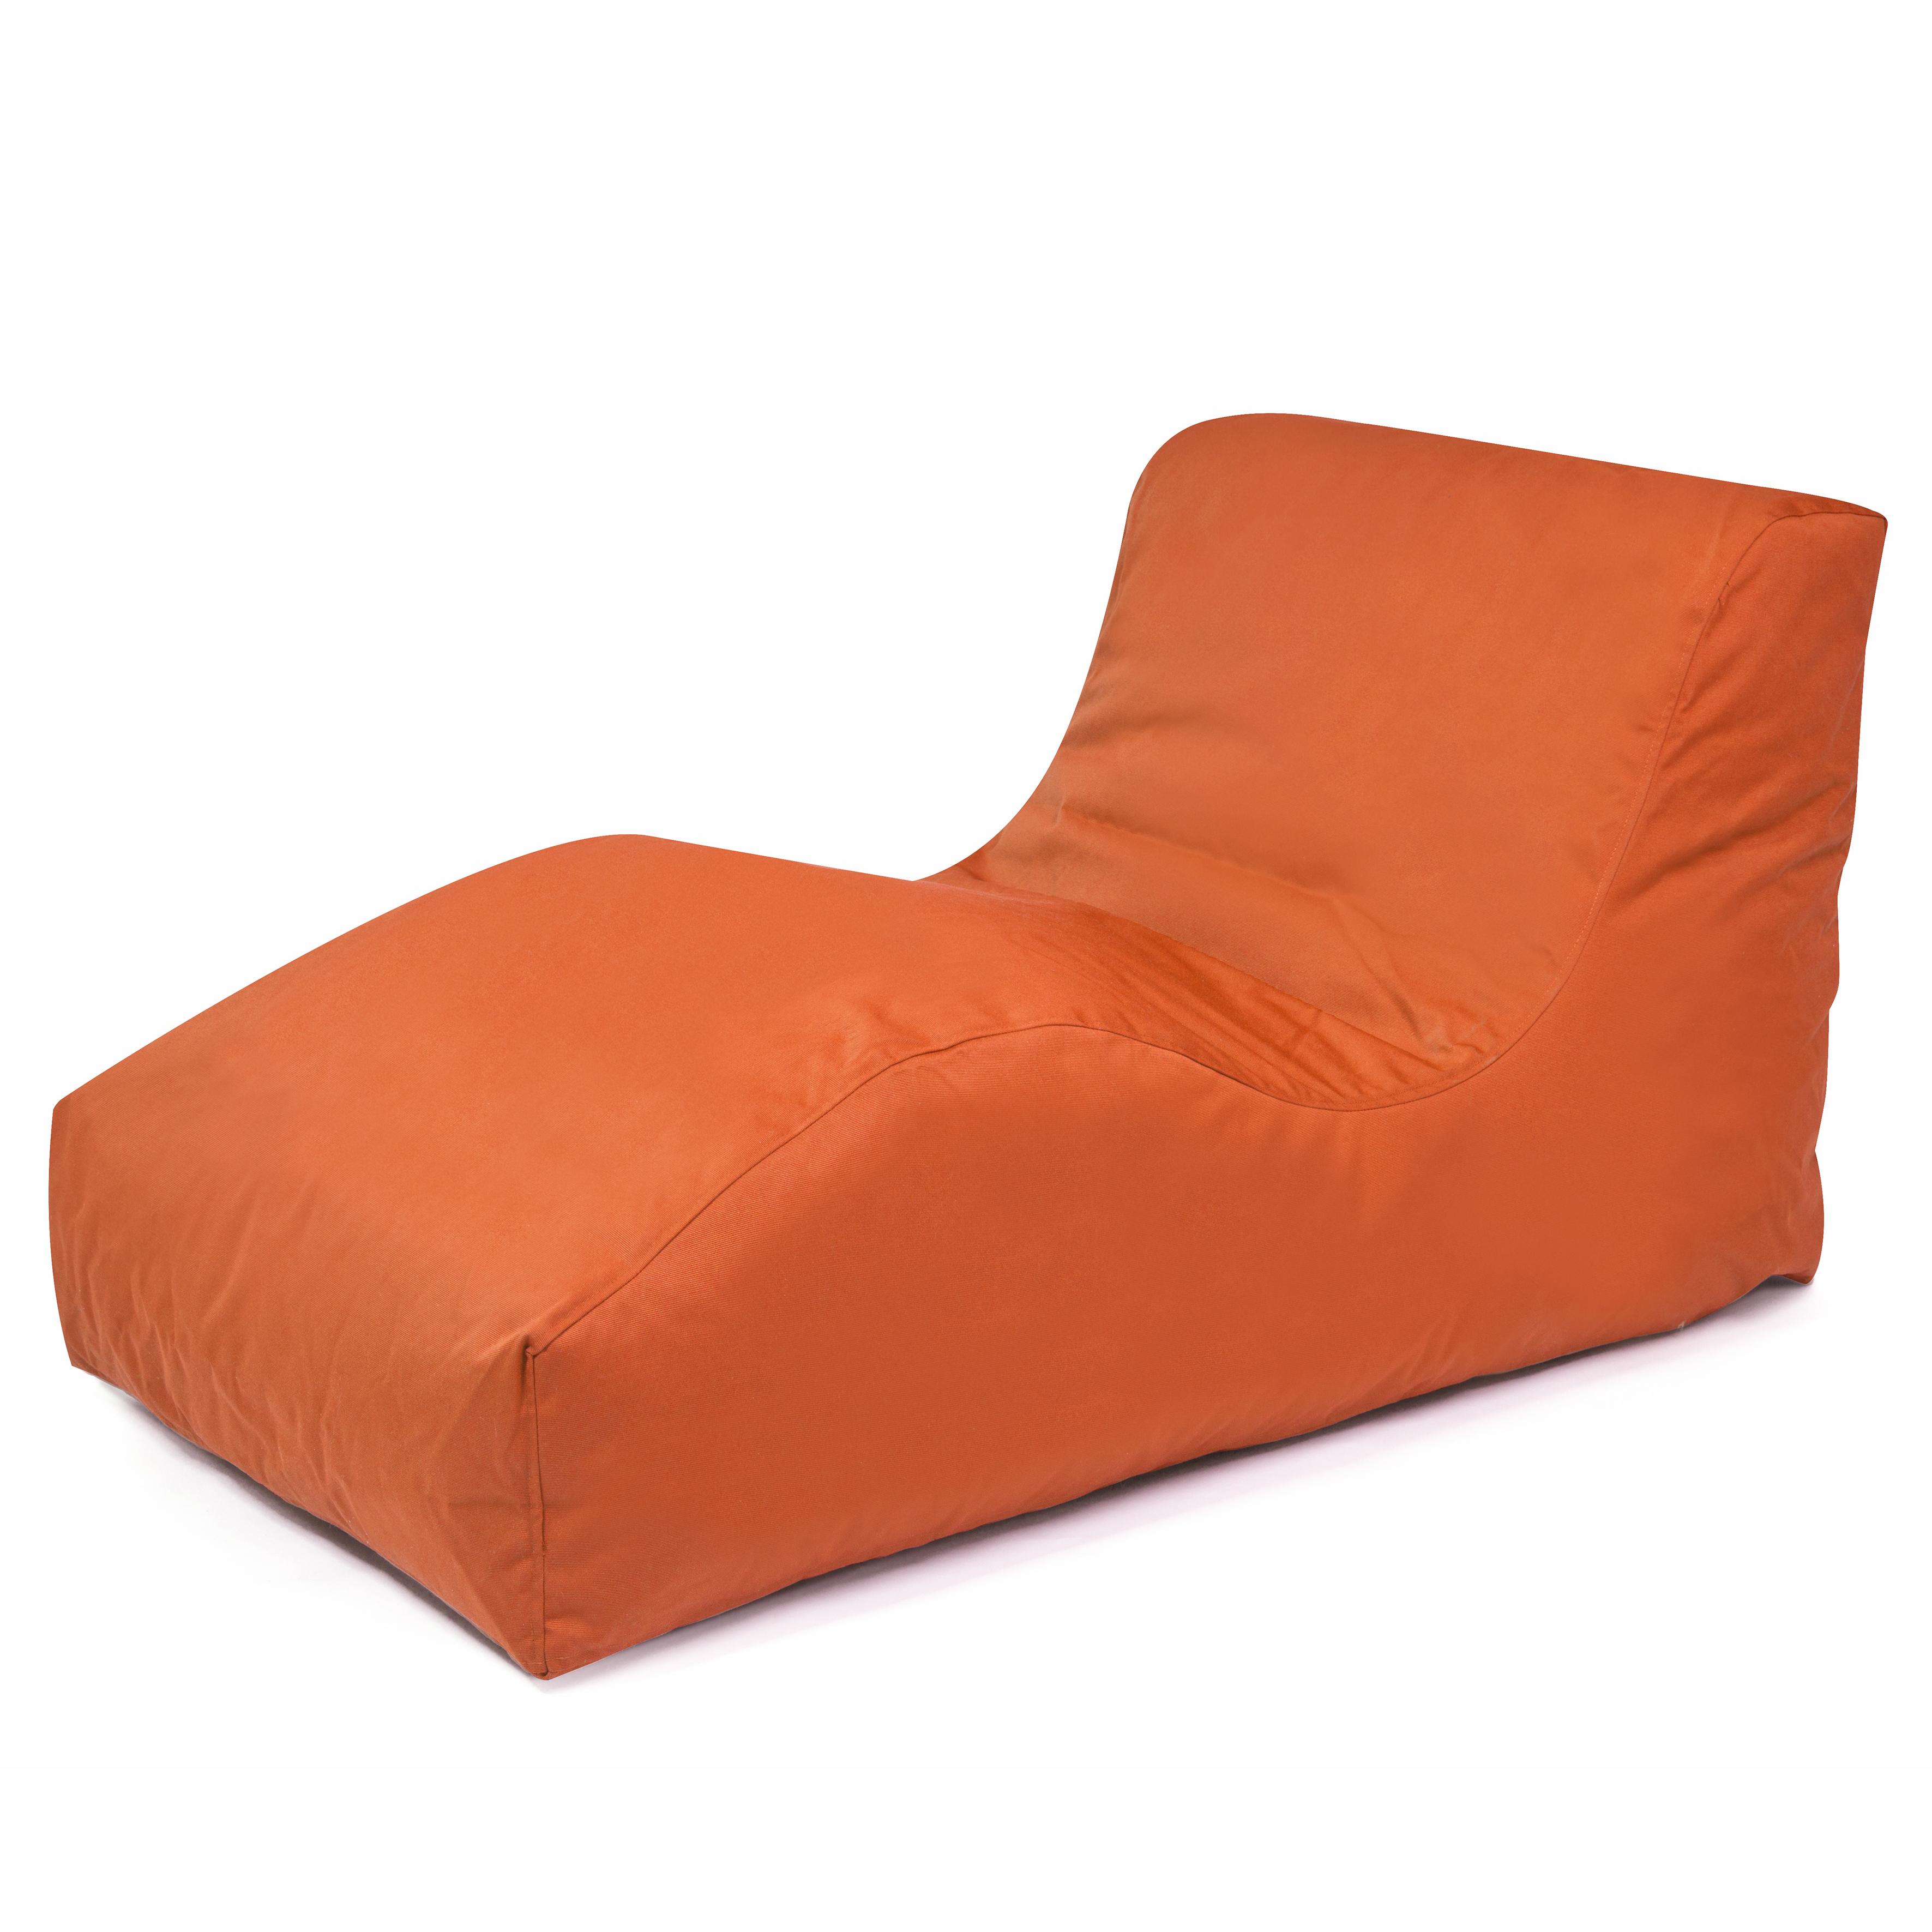 outbag outdoor gartenliege wave 125 x 70 cm wetterfest sitzsack lounge garten ebay. Black Bedroom Furniture Sets. Home Design Ideas